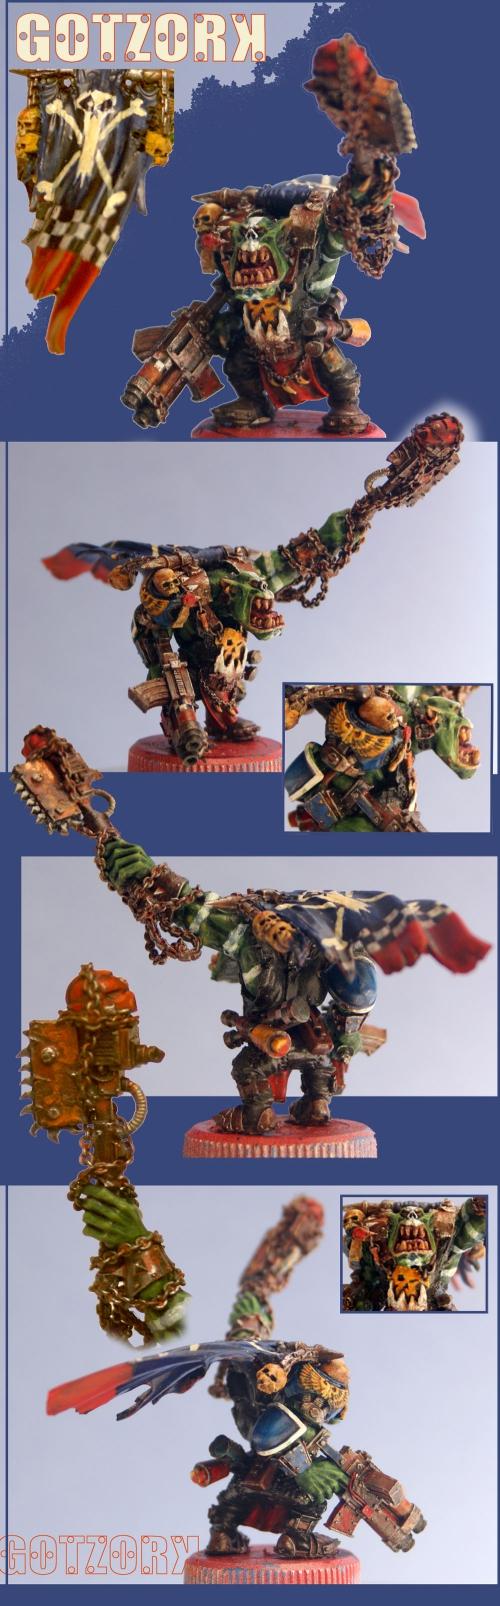 Warlord-Gotzork-bandeau-vert.jpg